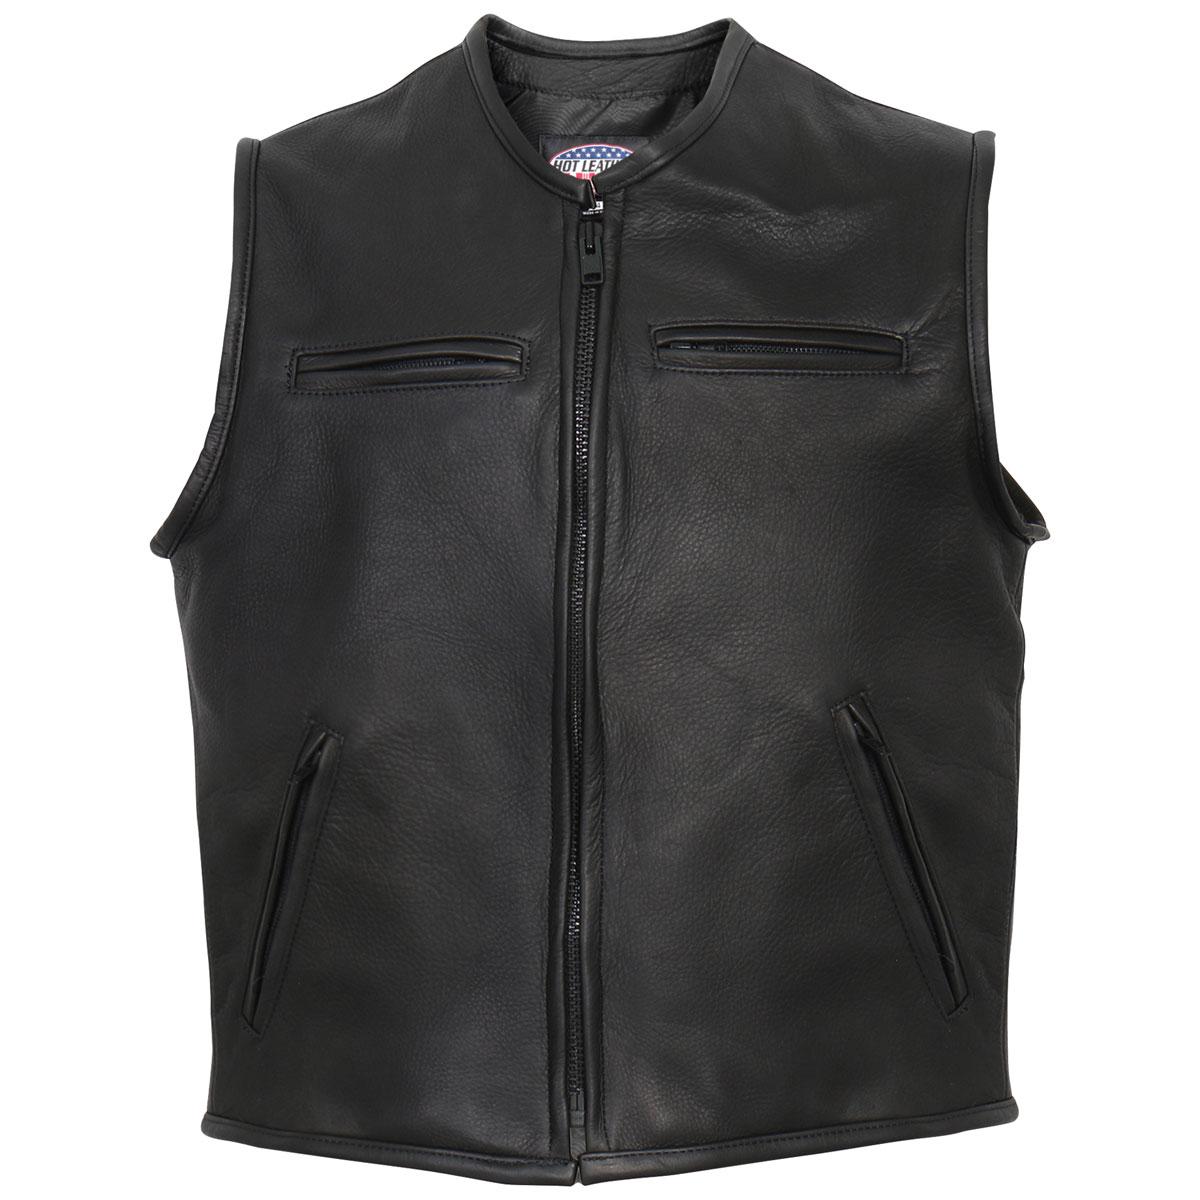 Hot Leathers Men's USA Made Steerhide Black Leather Vest